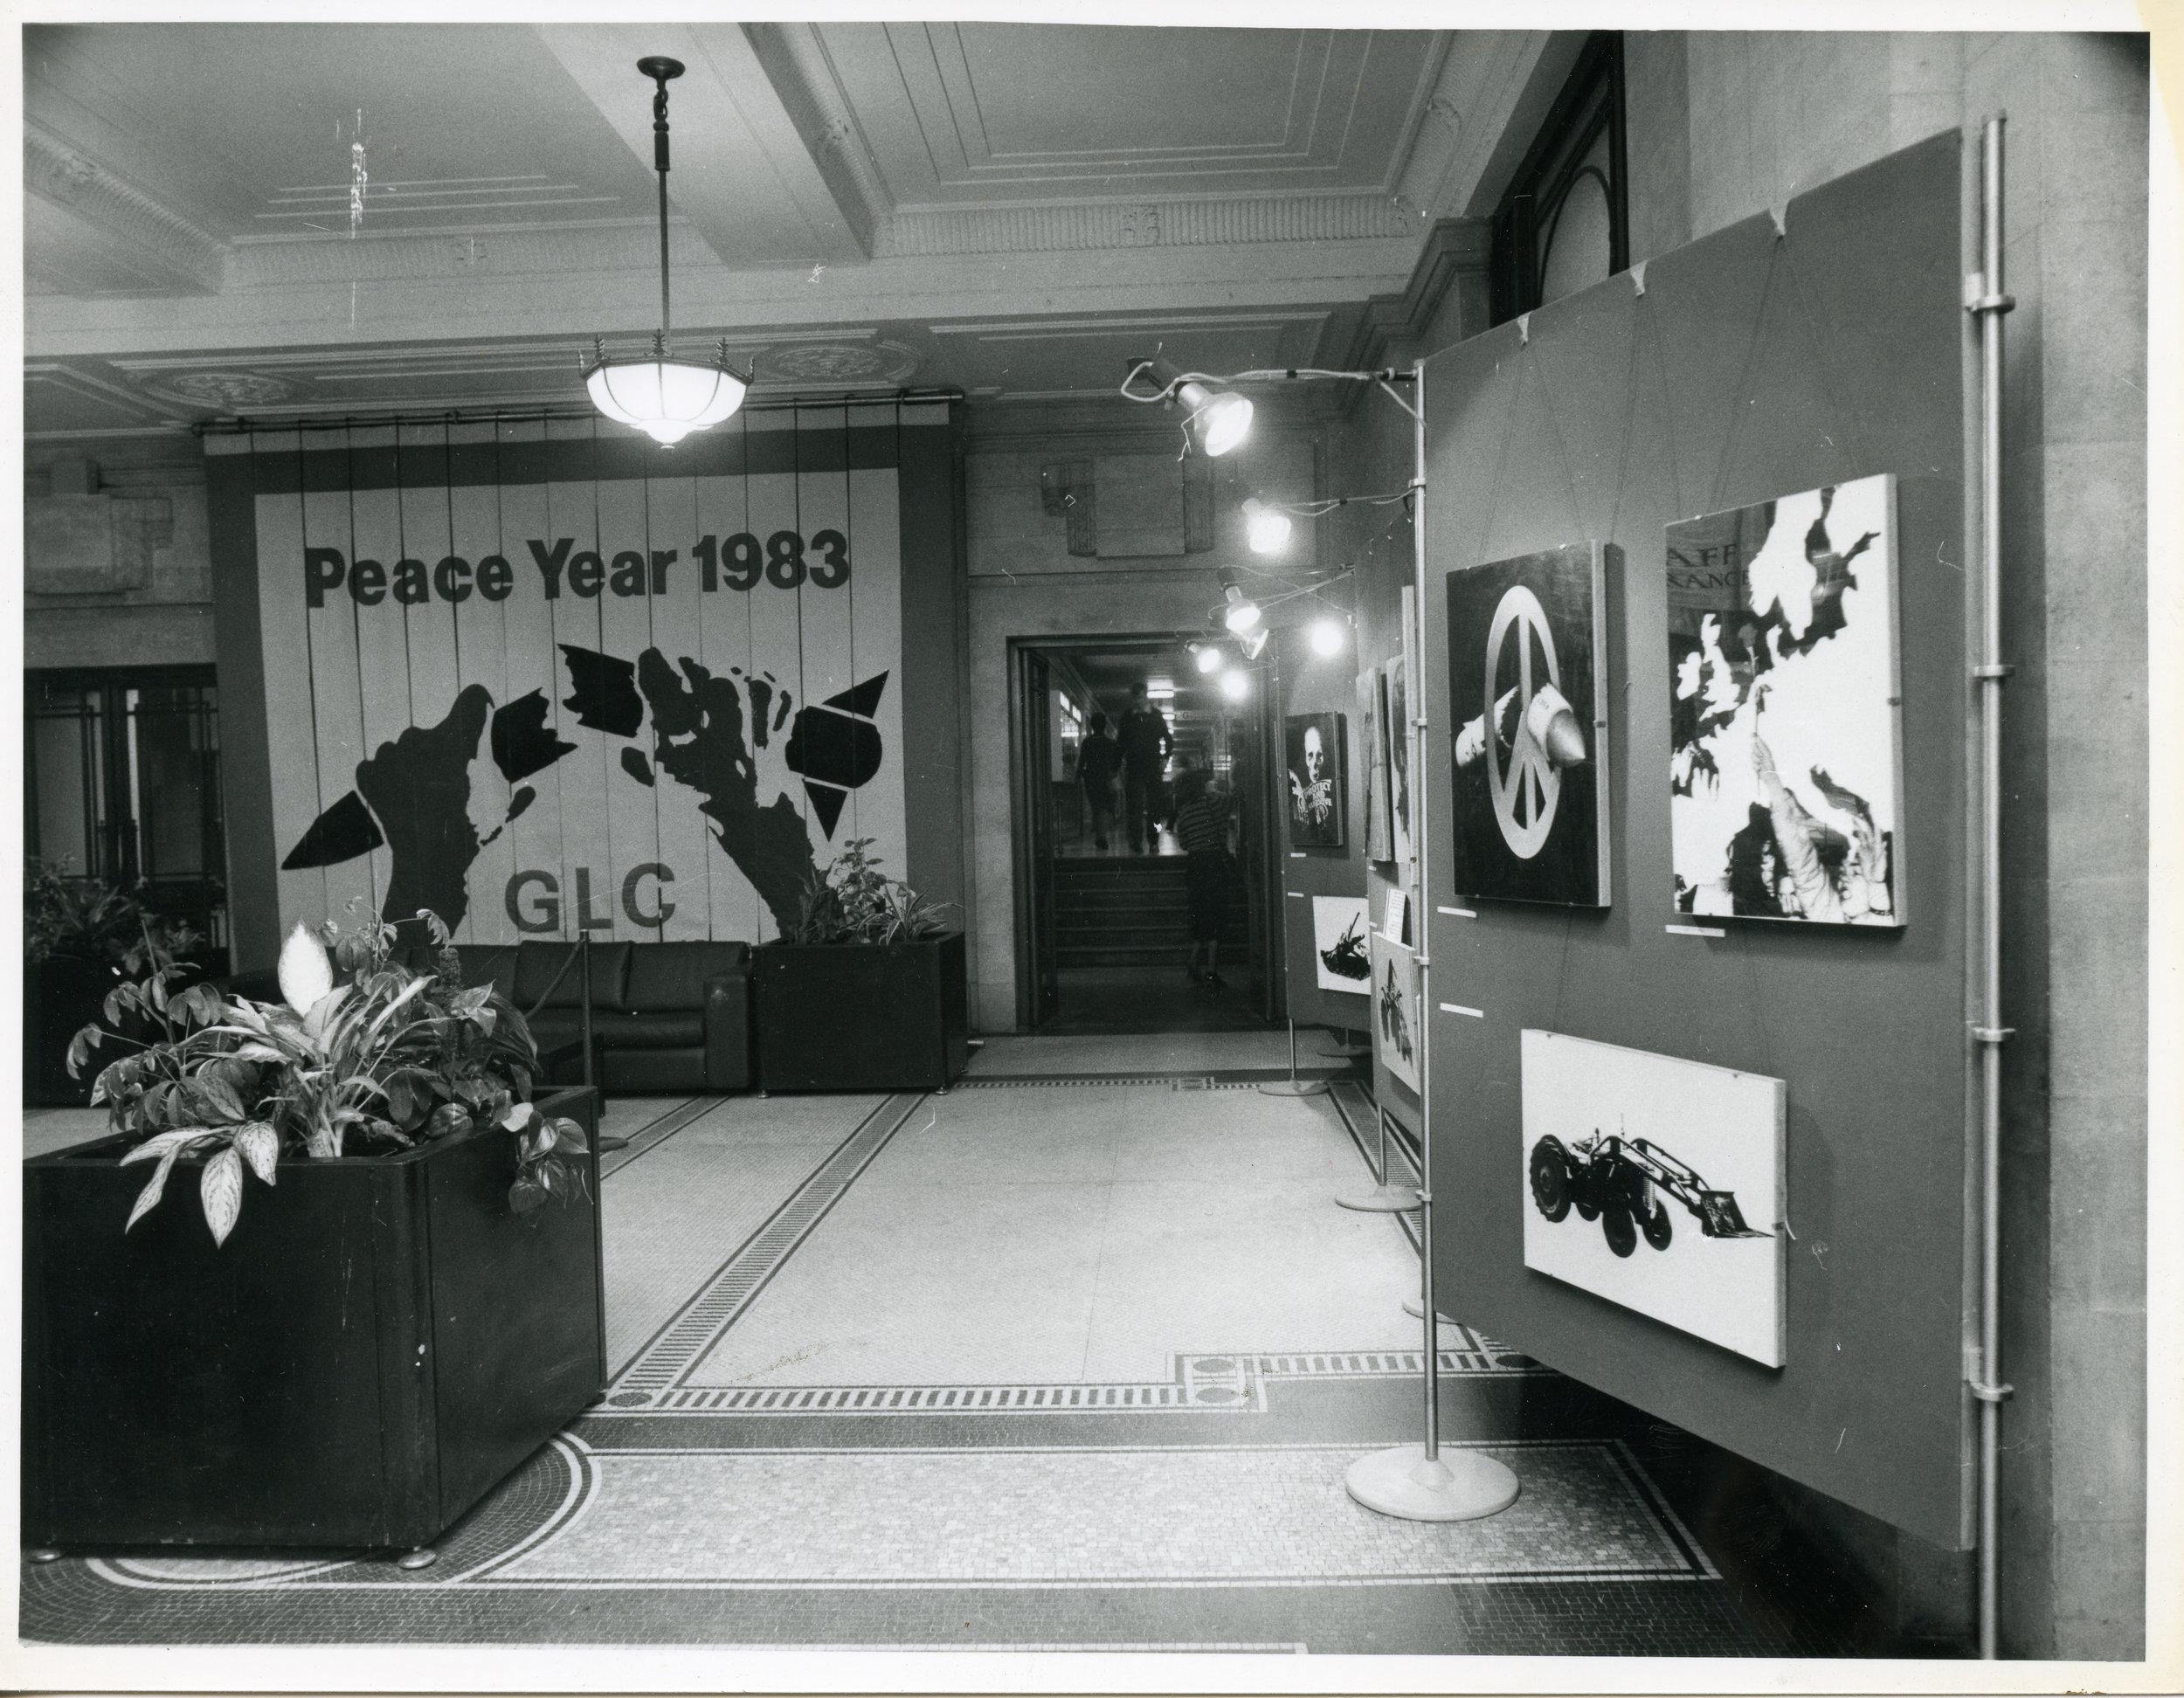 GLC Peace Year, County Hall, 1983